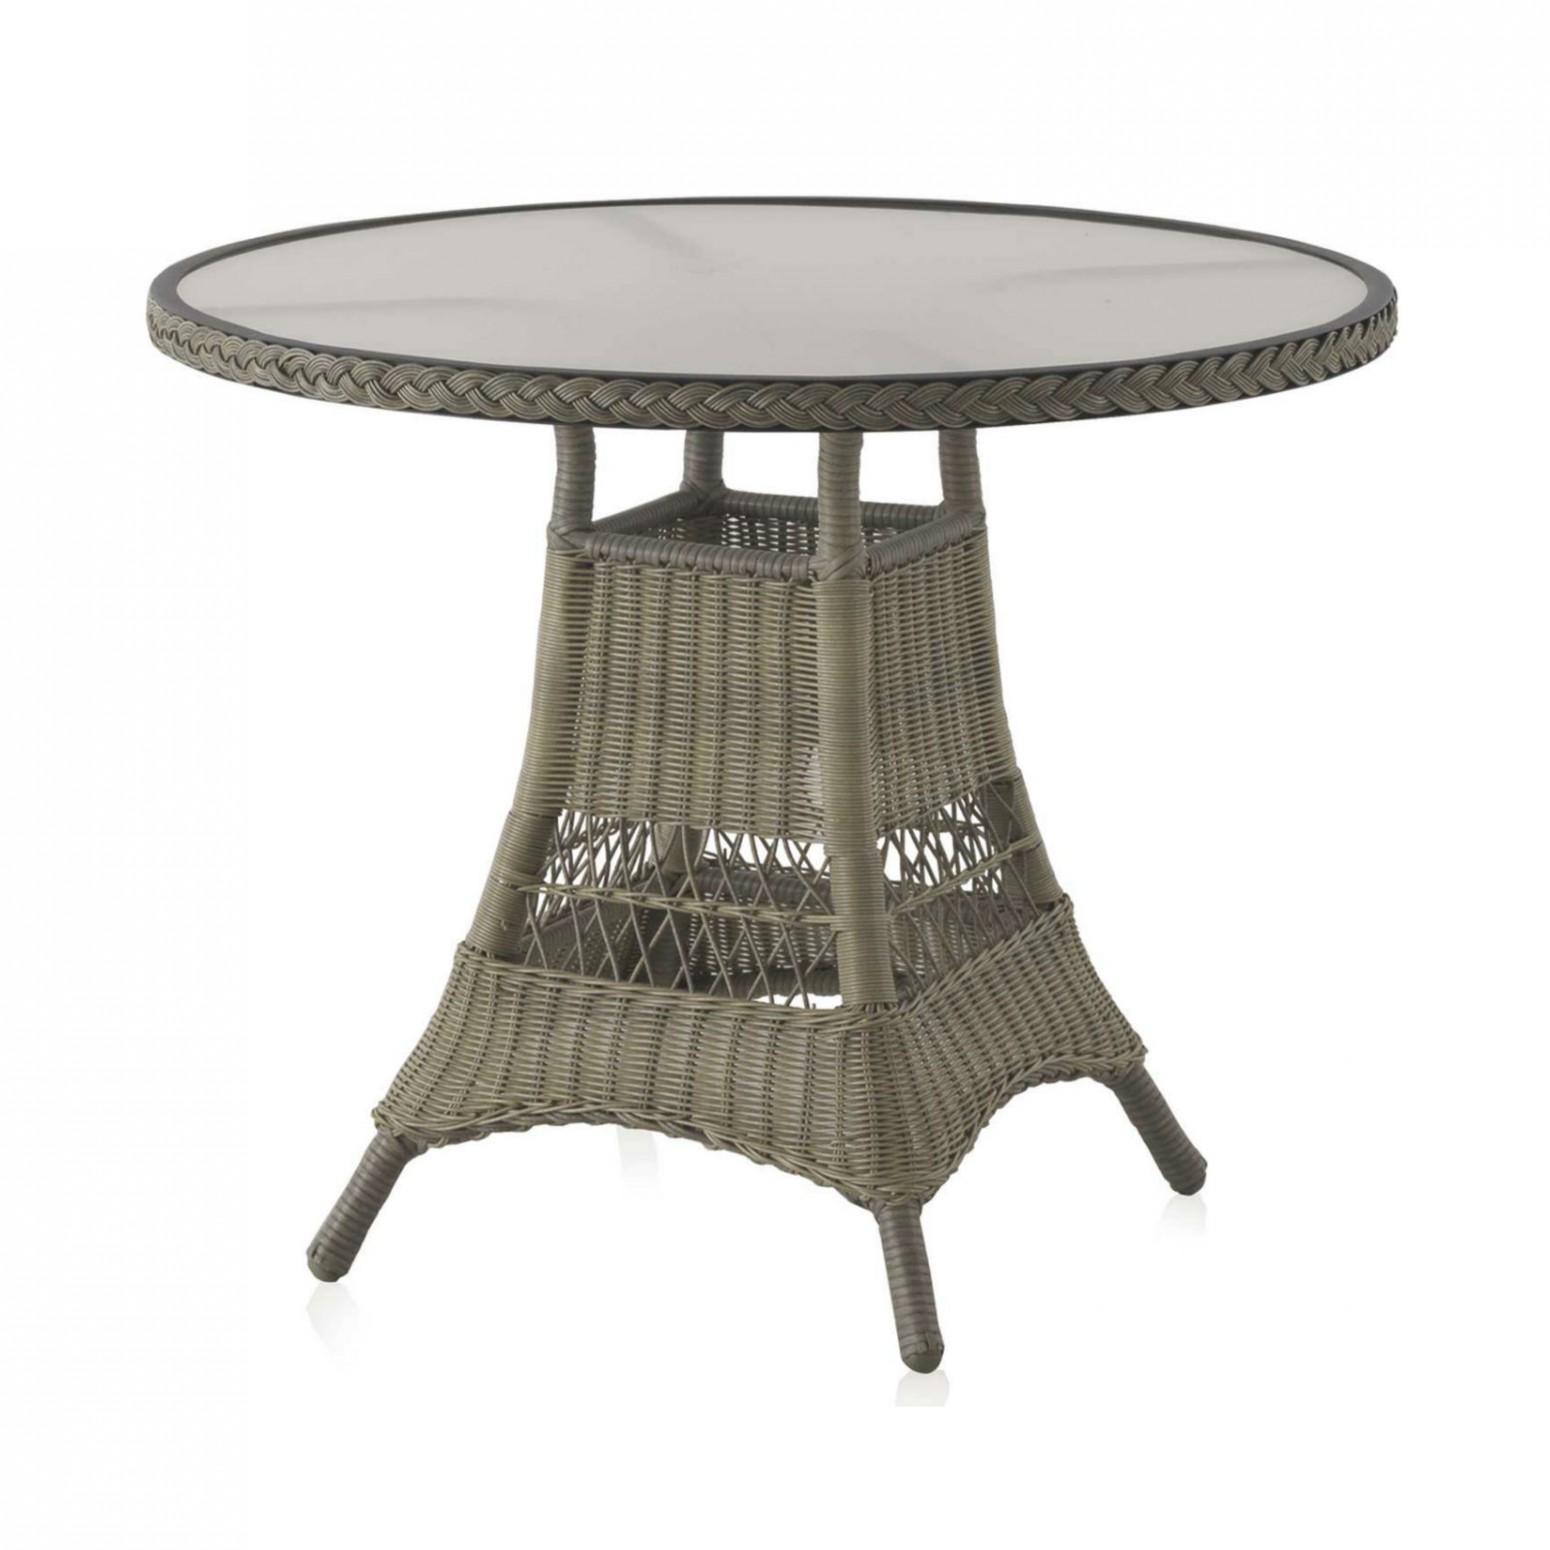 table de jardin ronde 70 cm en aluminium et resine tressee